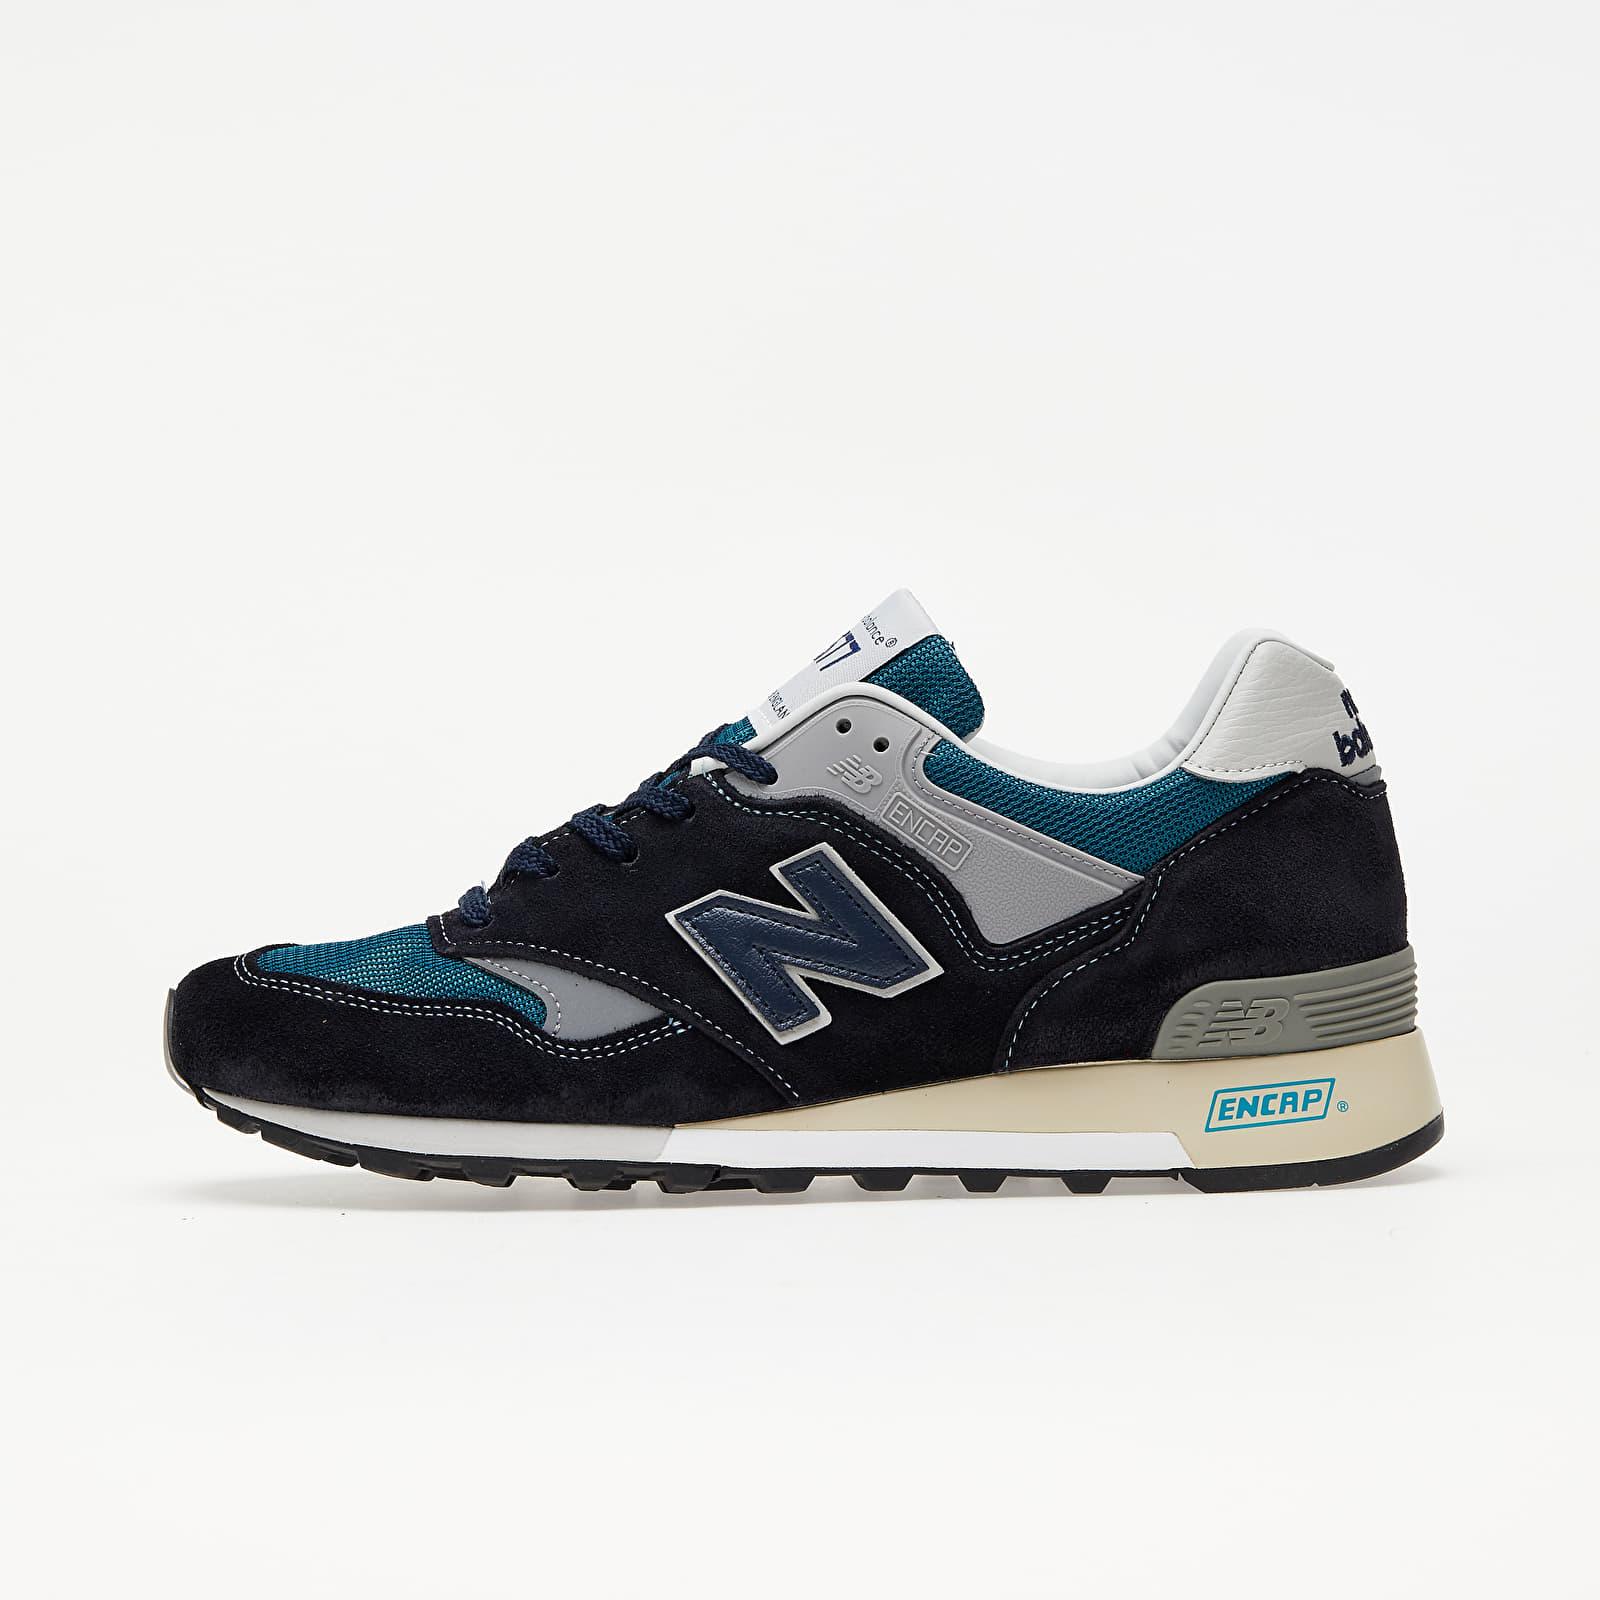 New Balance 577 Black/ Green   Footshop